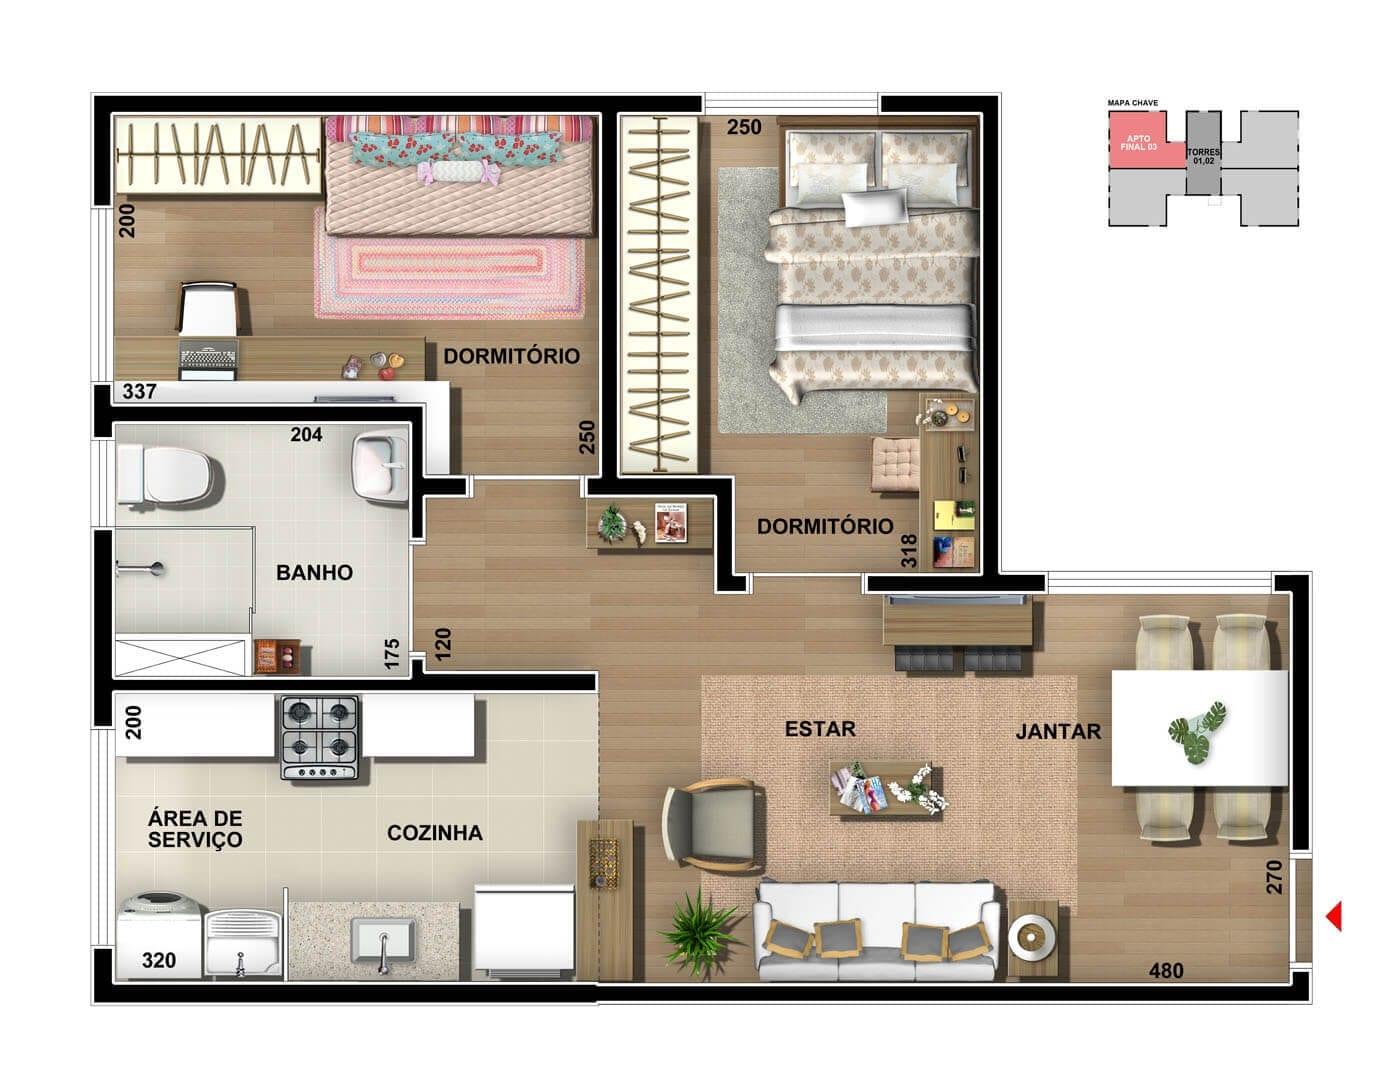 vic-engenharia-master-tower-siena-apartamento-terreo-pne-variacao